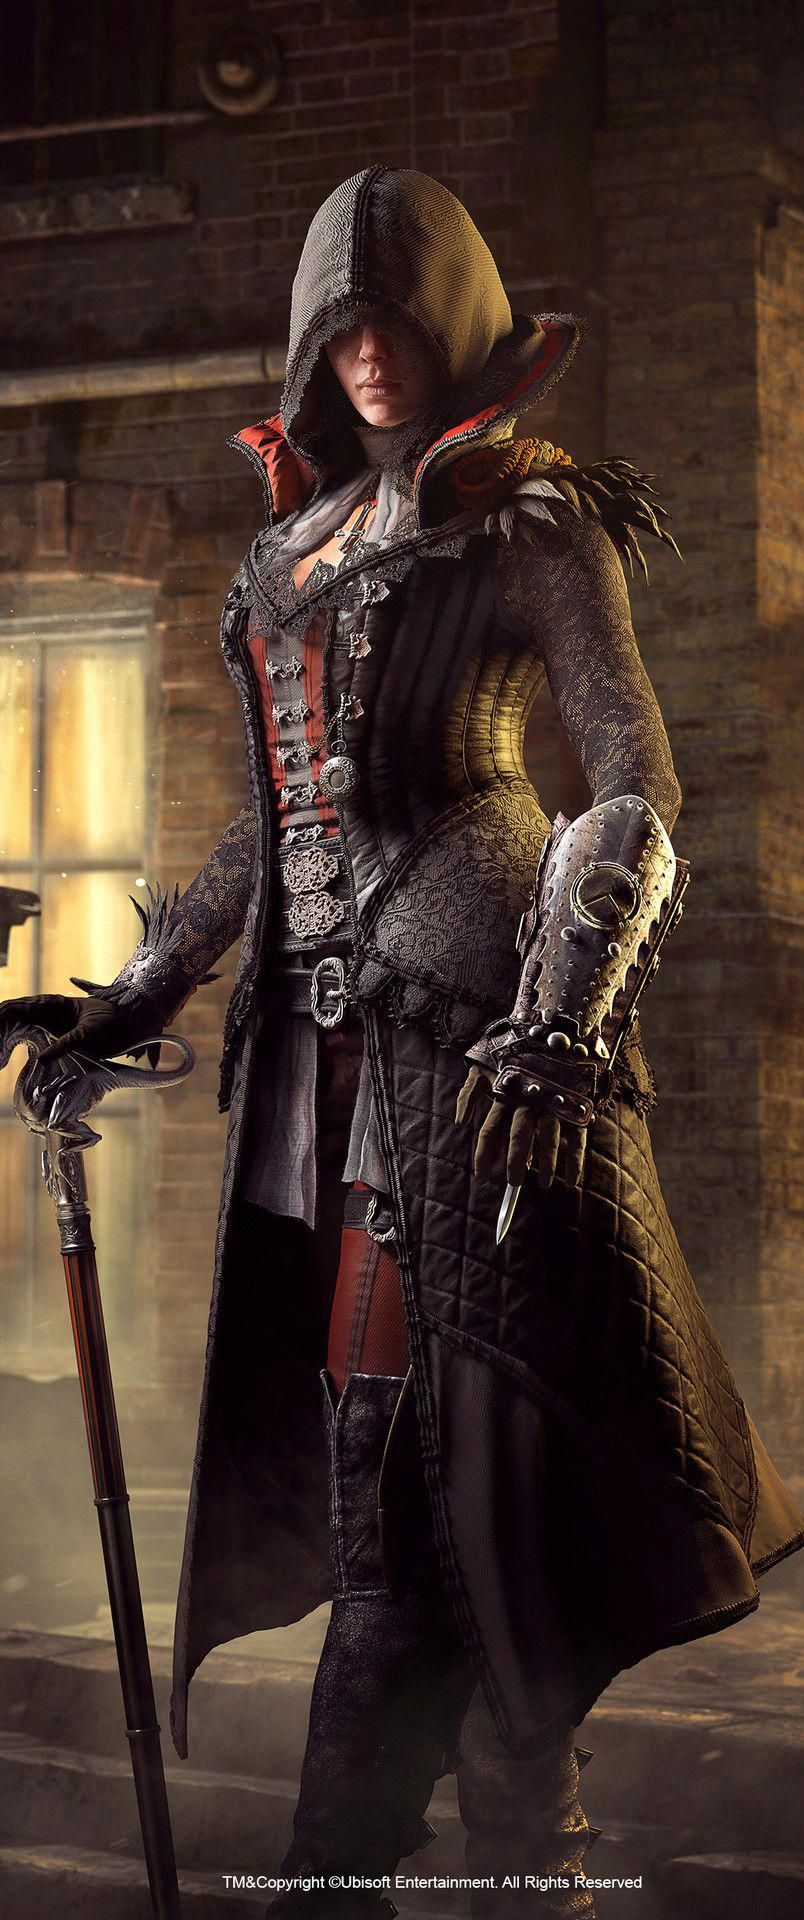 f Rogue Assassin Med Armor Cloak Staff hidden fist punch